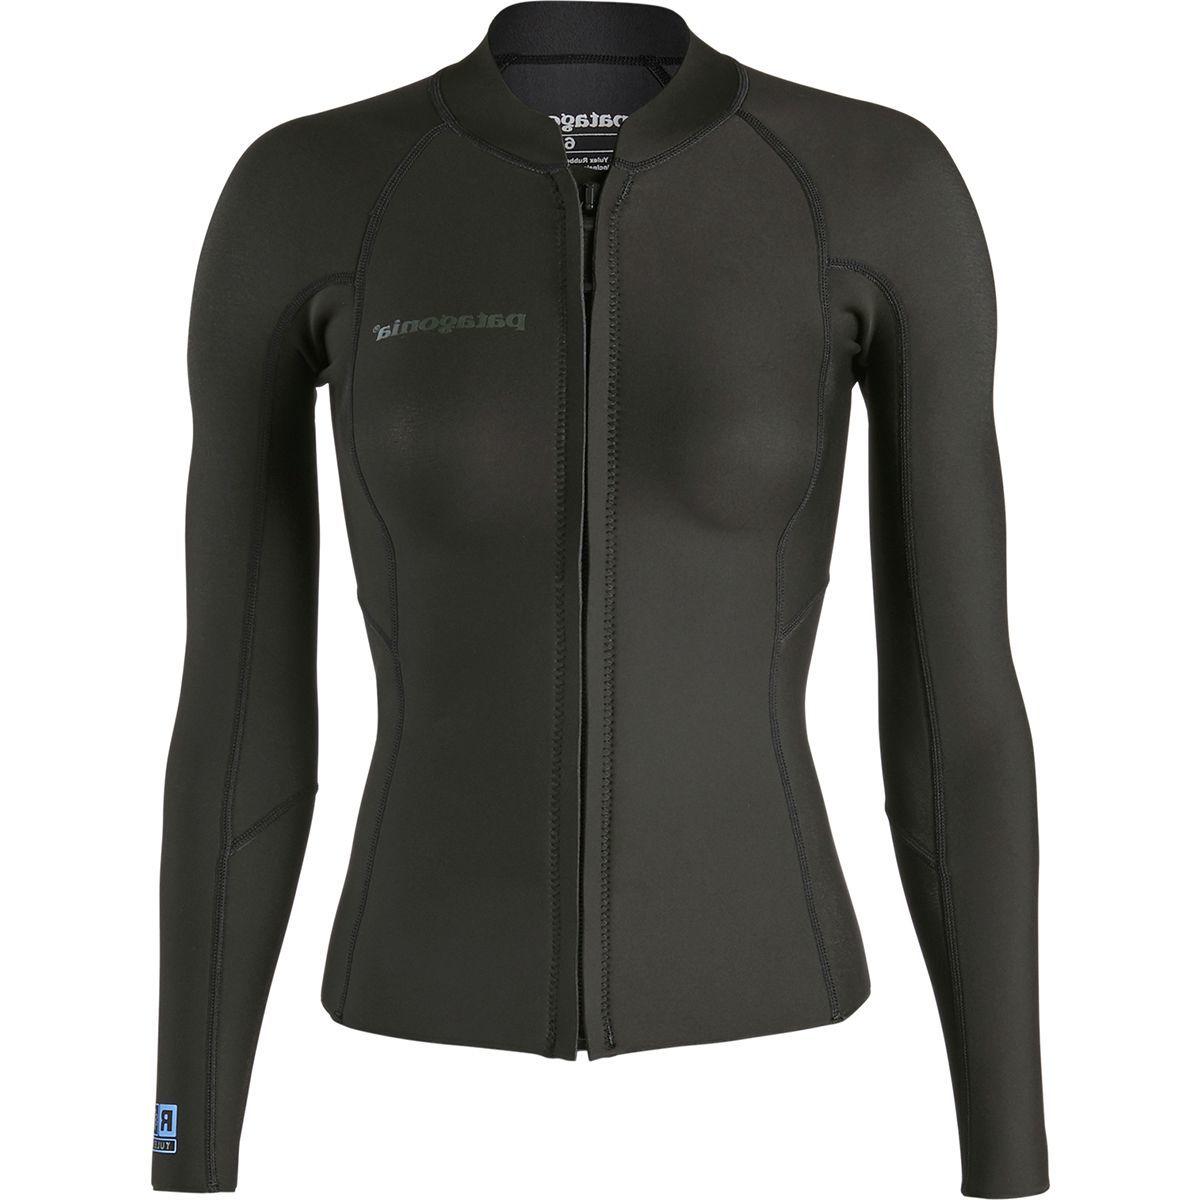 Patagonia R1 Lite Yulex Long-Sleeve Top - Women's